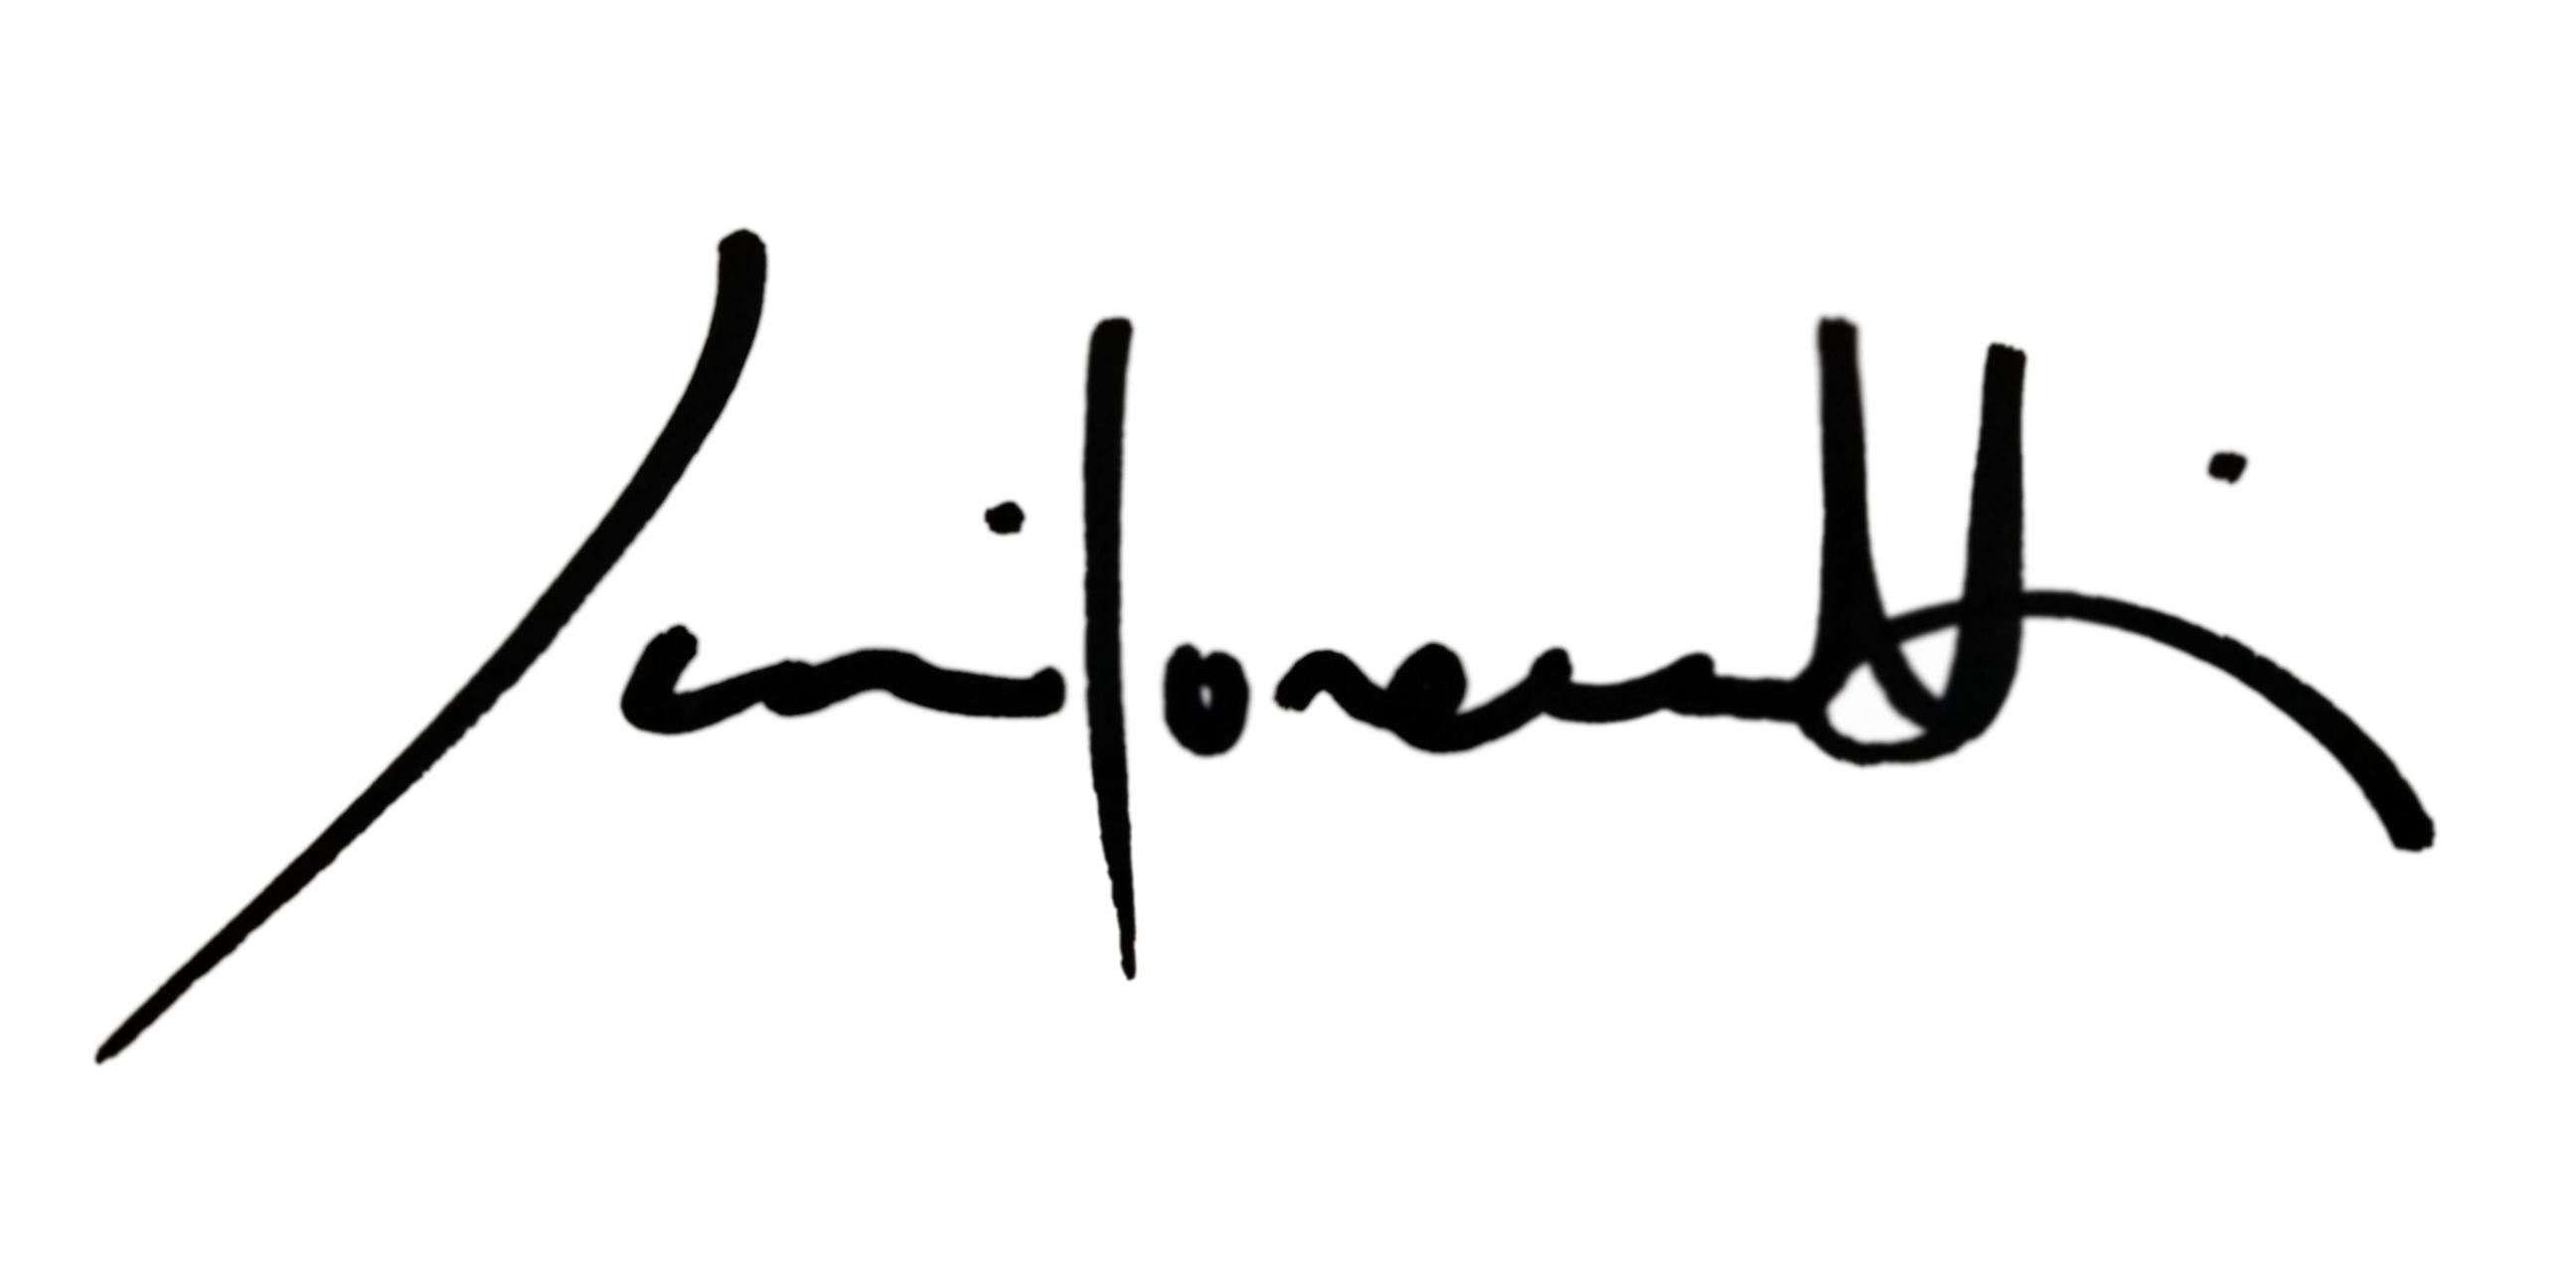 Juri Lorenzetti's Signature